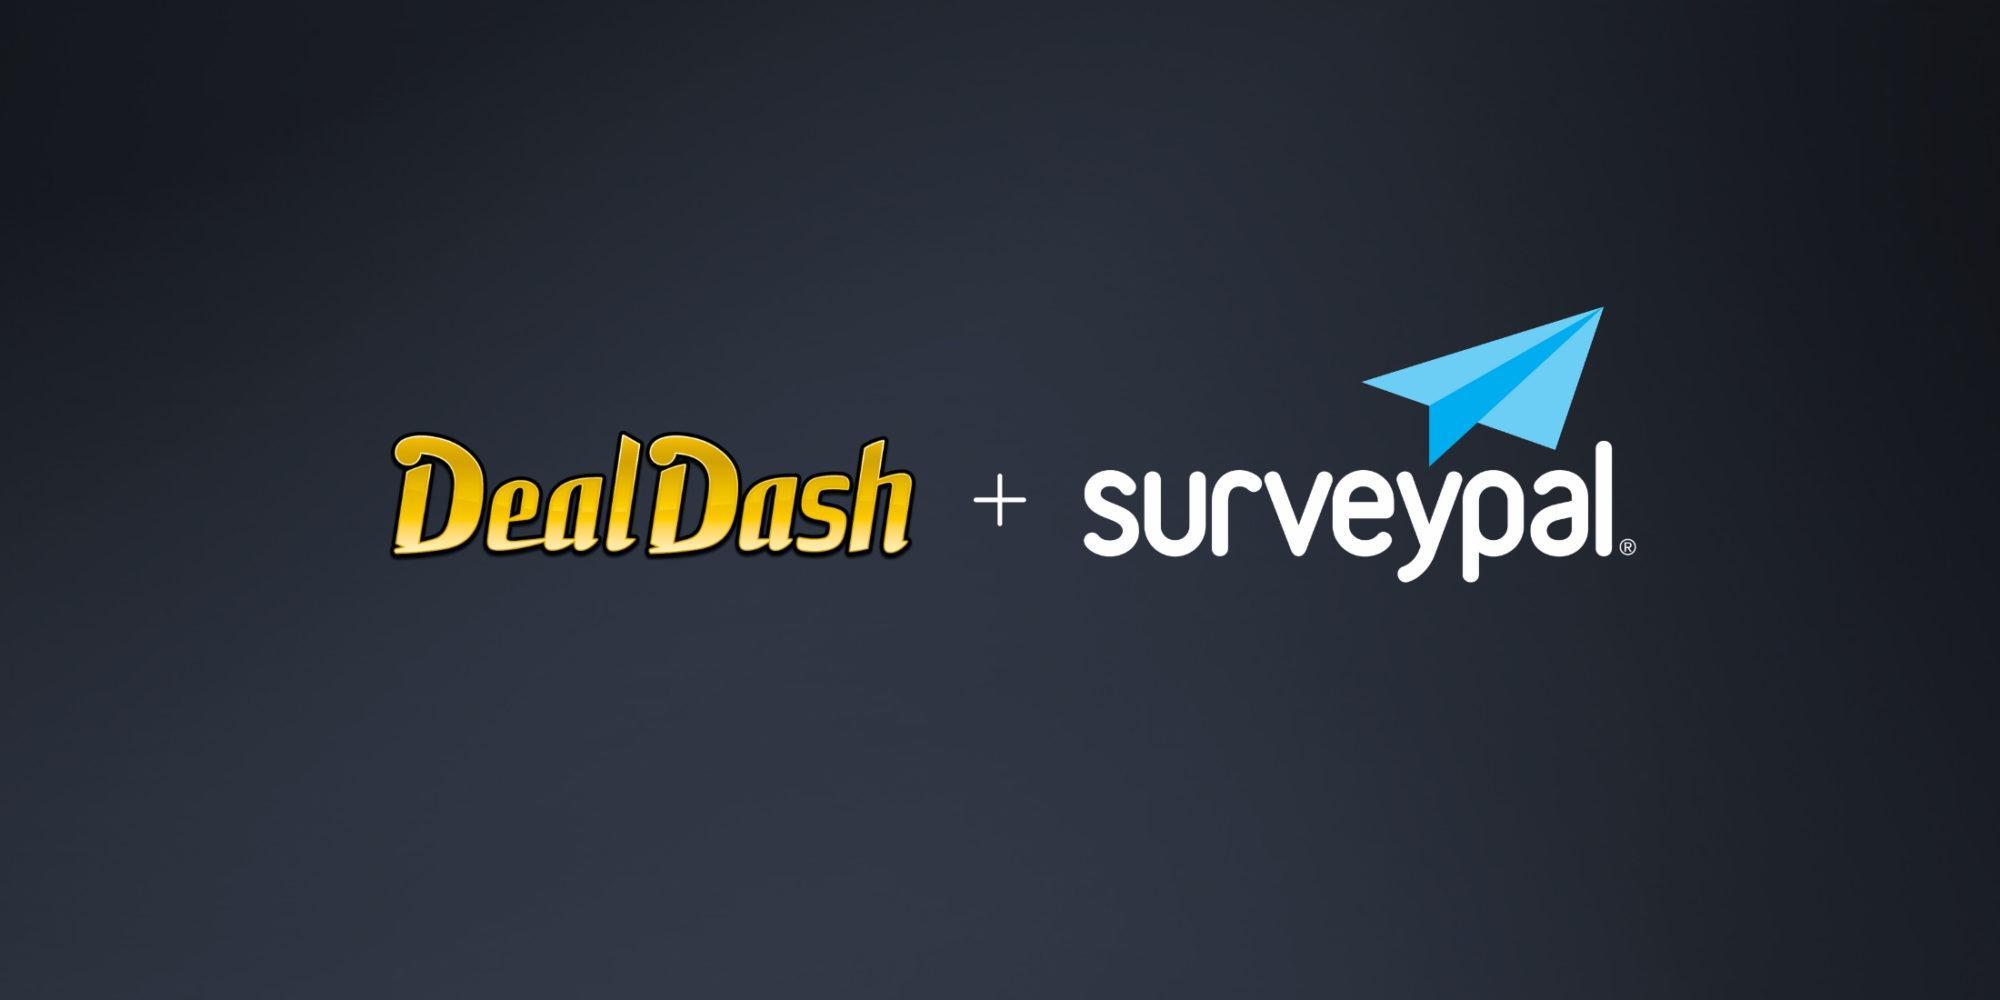 DealDash logo and Surveypal logo against a dark background